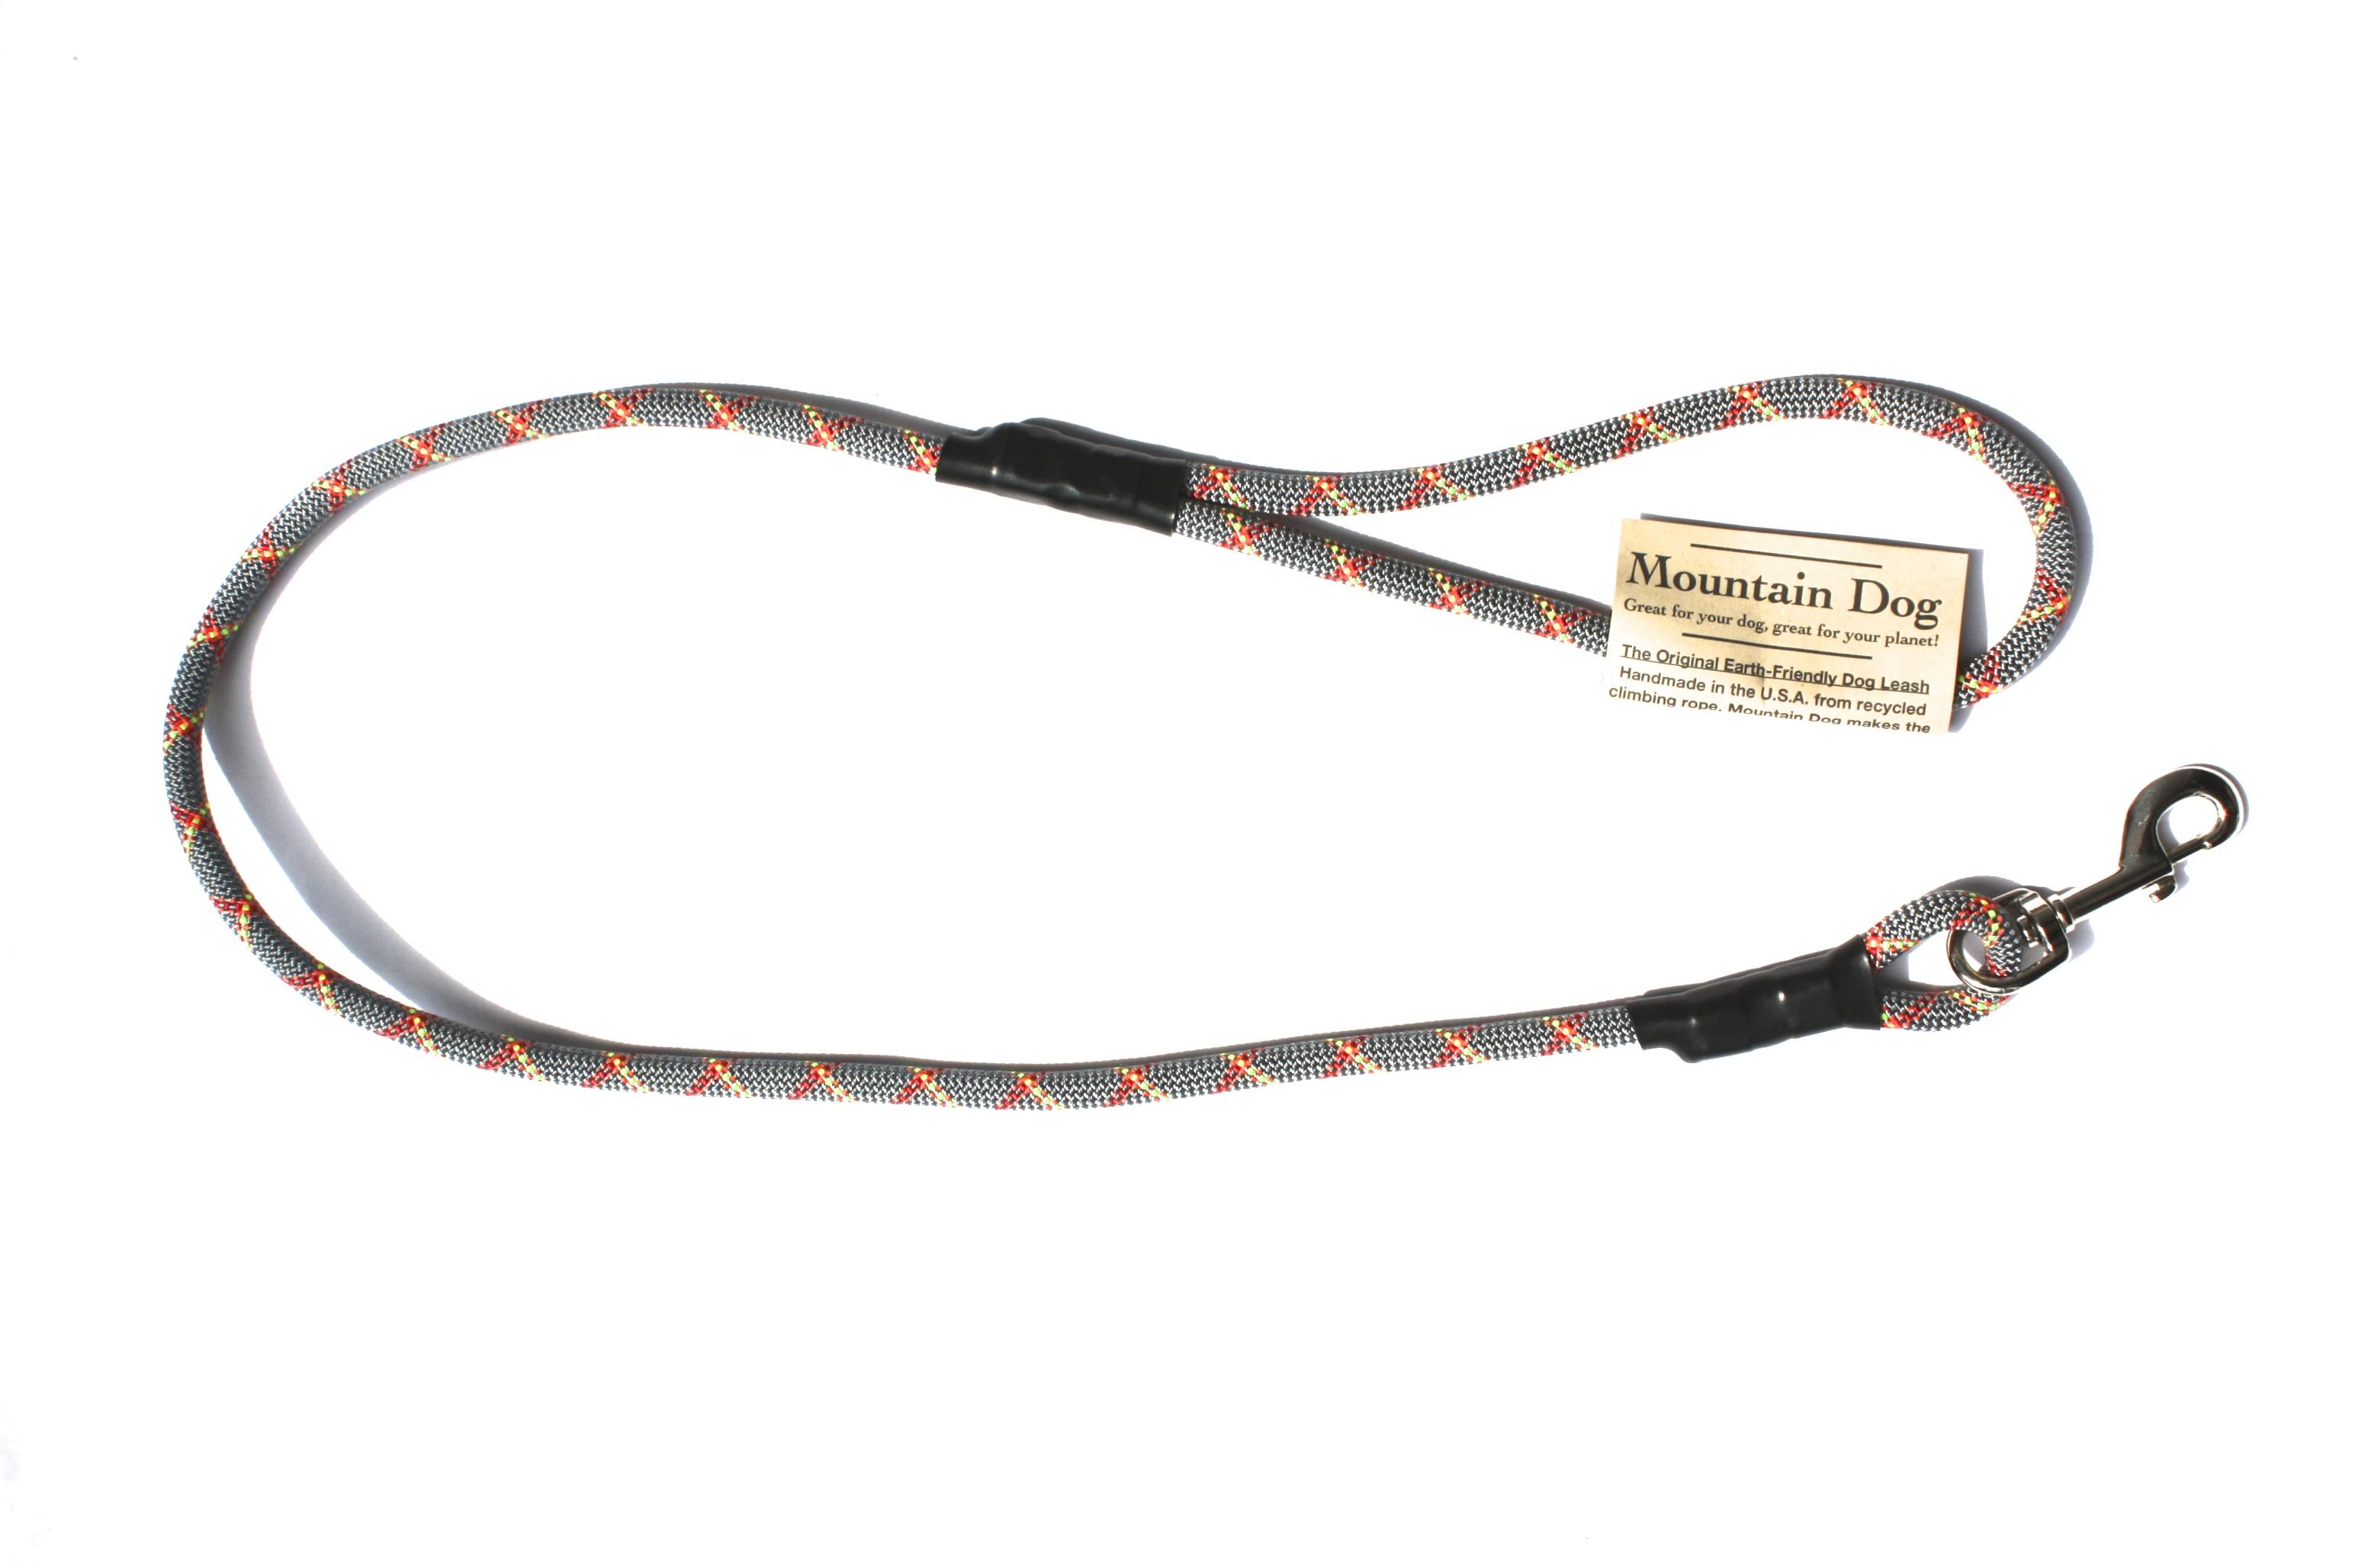 Mountain Dog Original Clip Leash マウンテン ドッグ オリジナルクリップ リード  3.9ft_d0217958_18562482.jpg